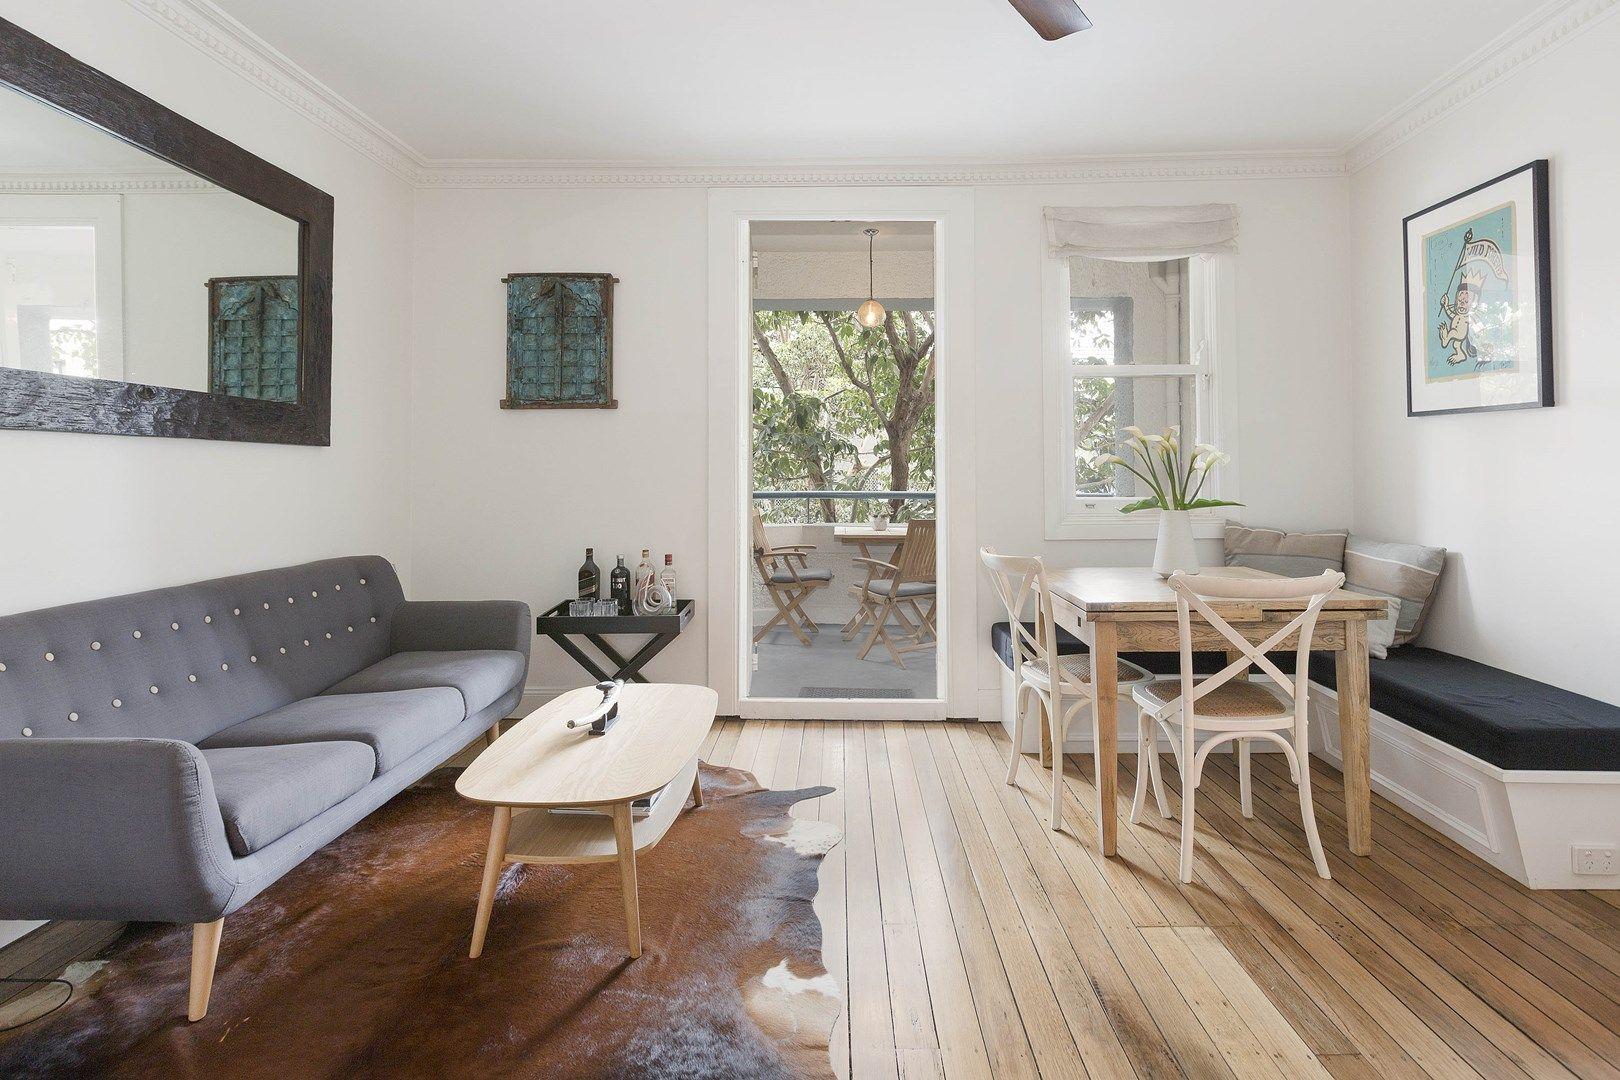 Apartment for sale at 5/265 Palmer Street, Darlinghurst